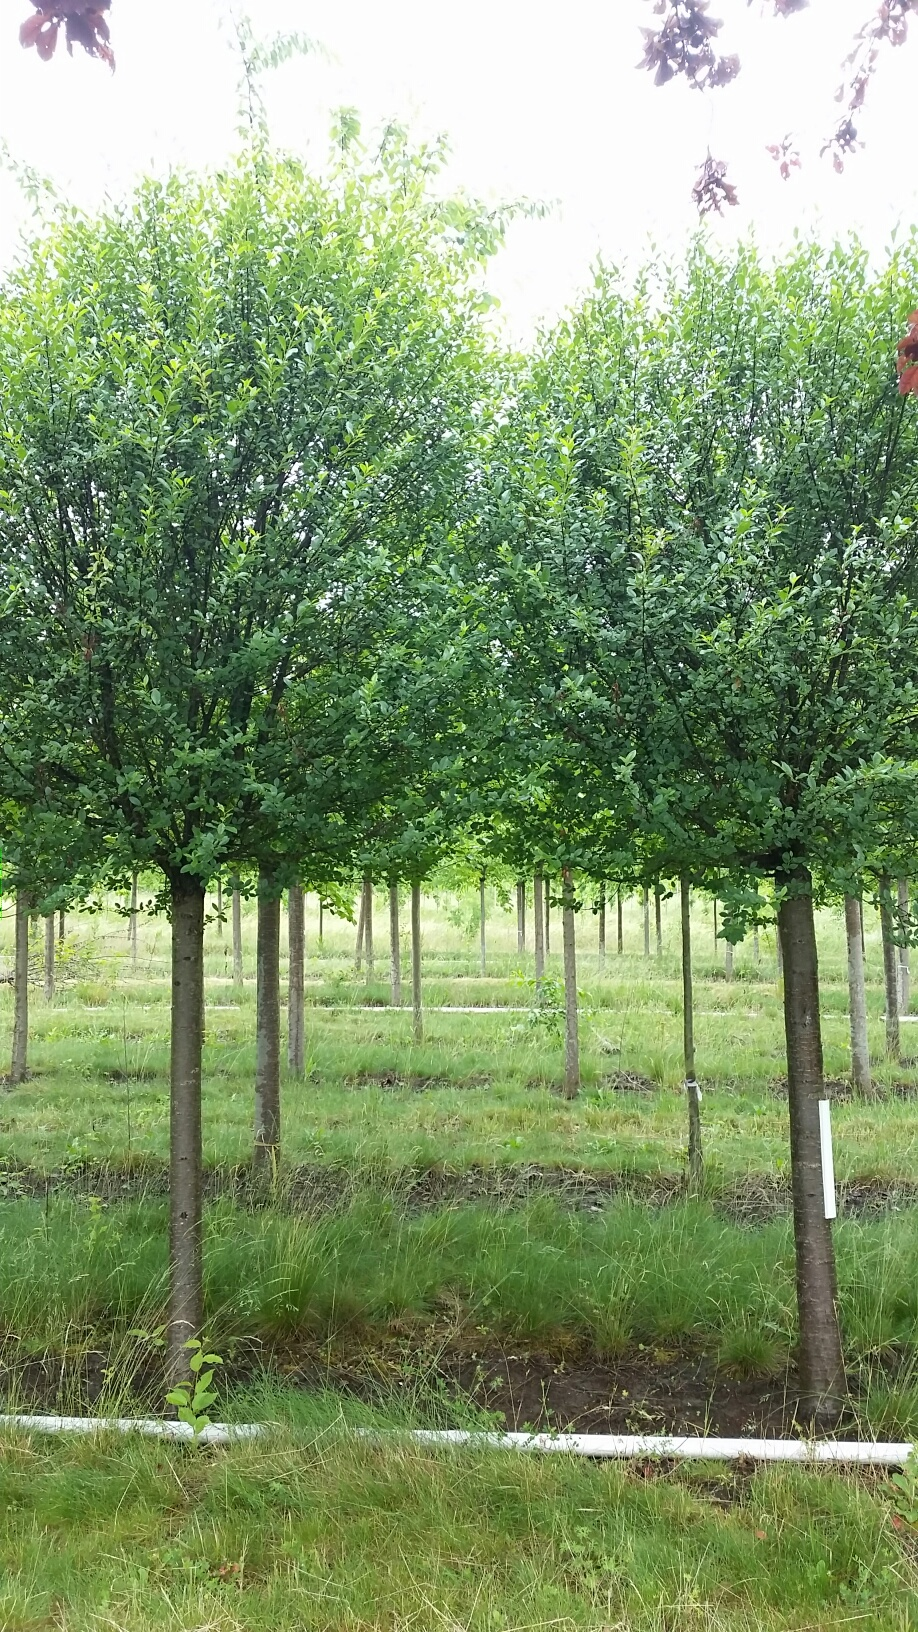 Prunus fr.  'Globosa' uniform high hedge or Allee accent